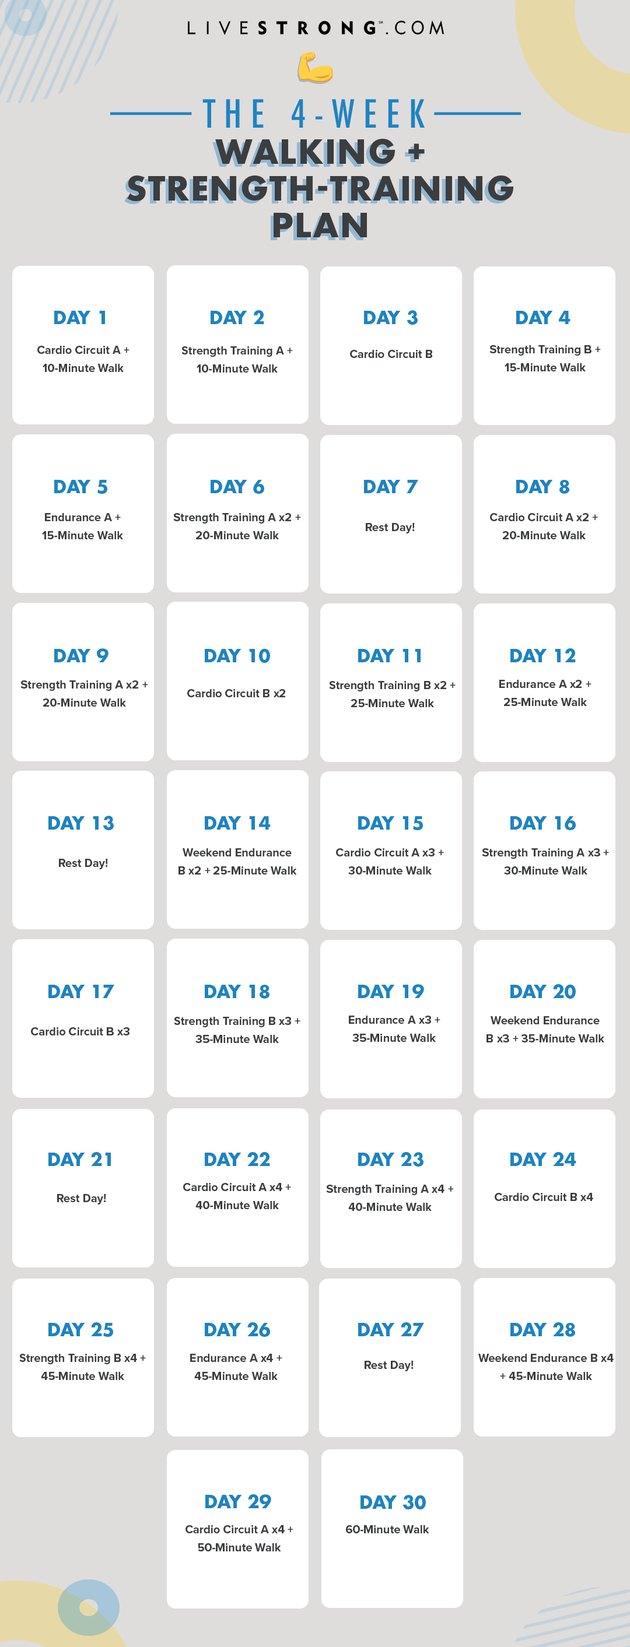 Printable calendar for A 4-Week Walking + Strength-Training Plan to Increase Endurance